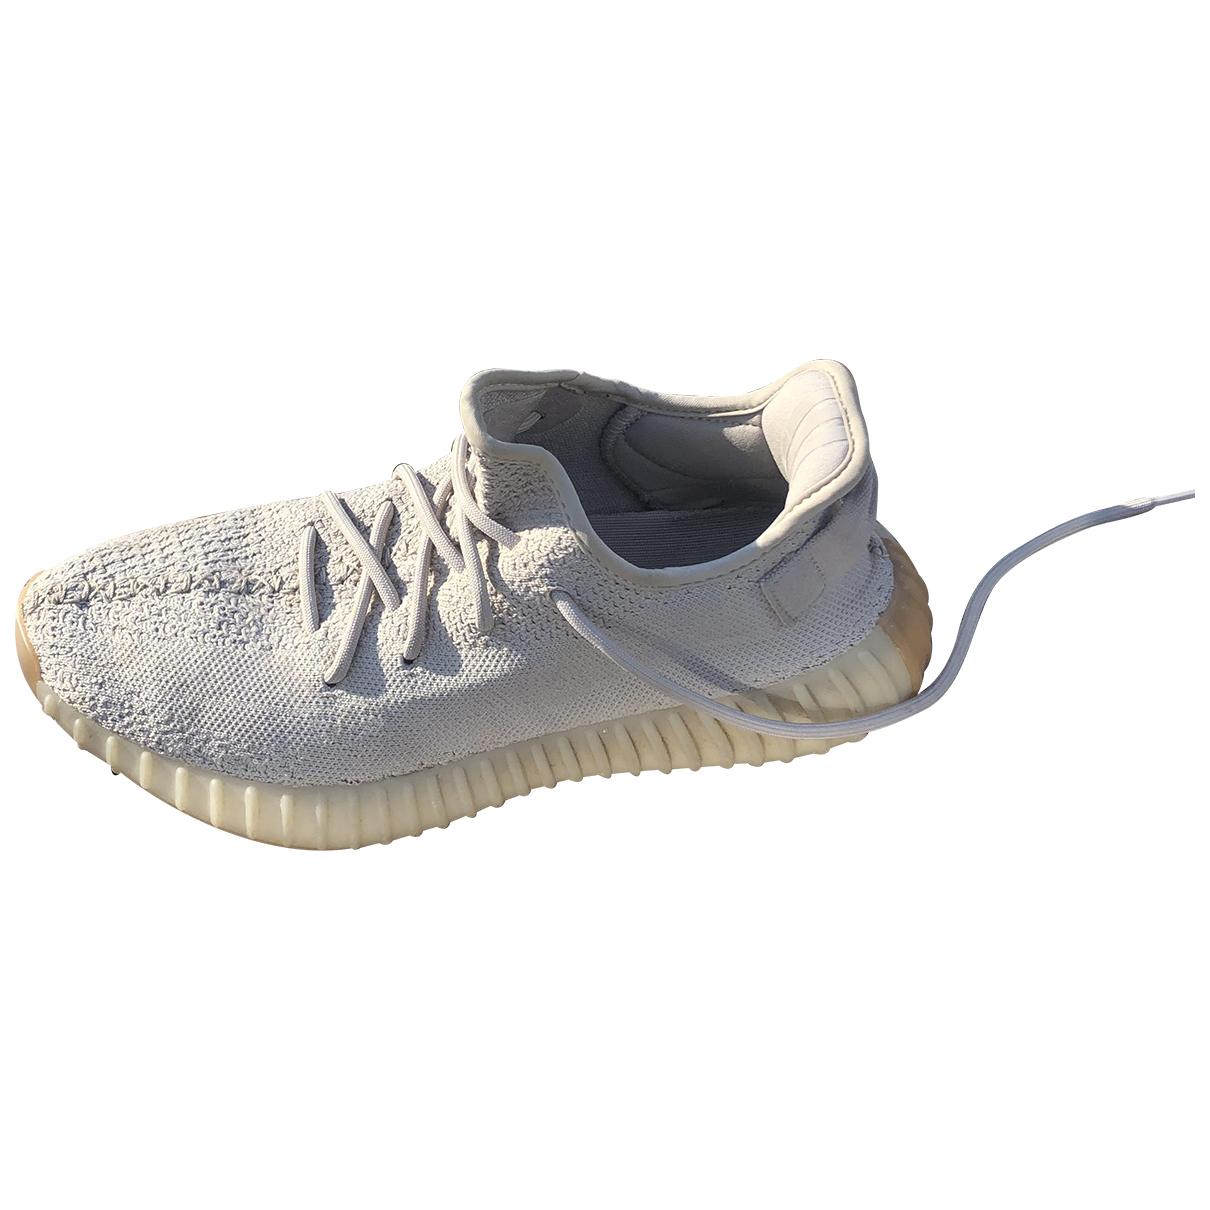 Yeezy X Adidas - Baskets Boost 350 V2 pour femme en toile - ecru